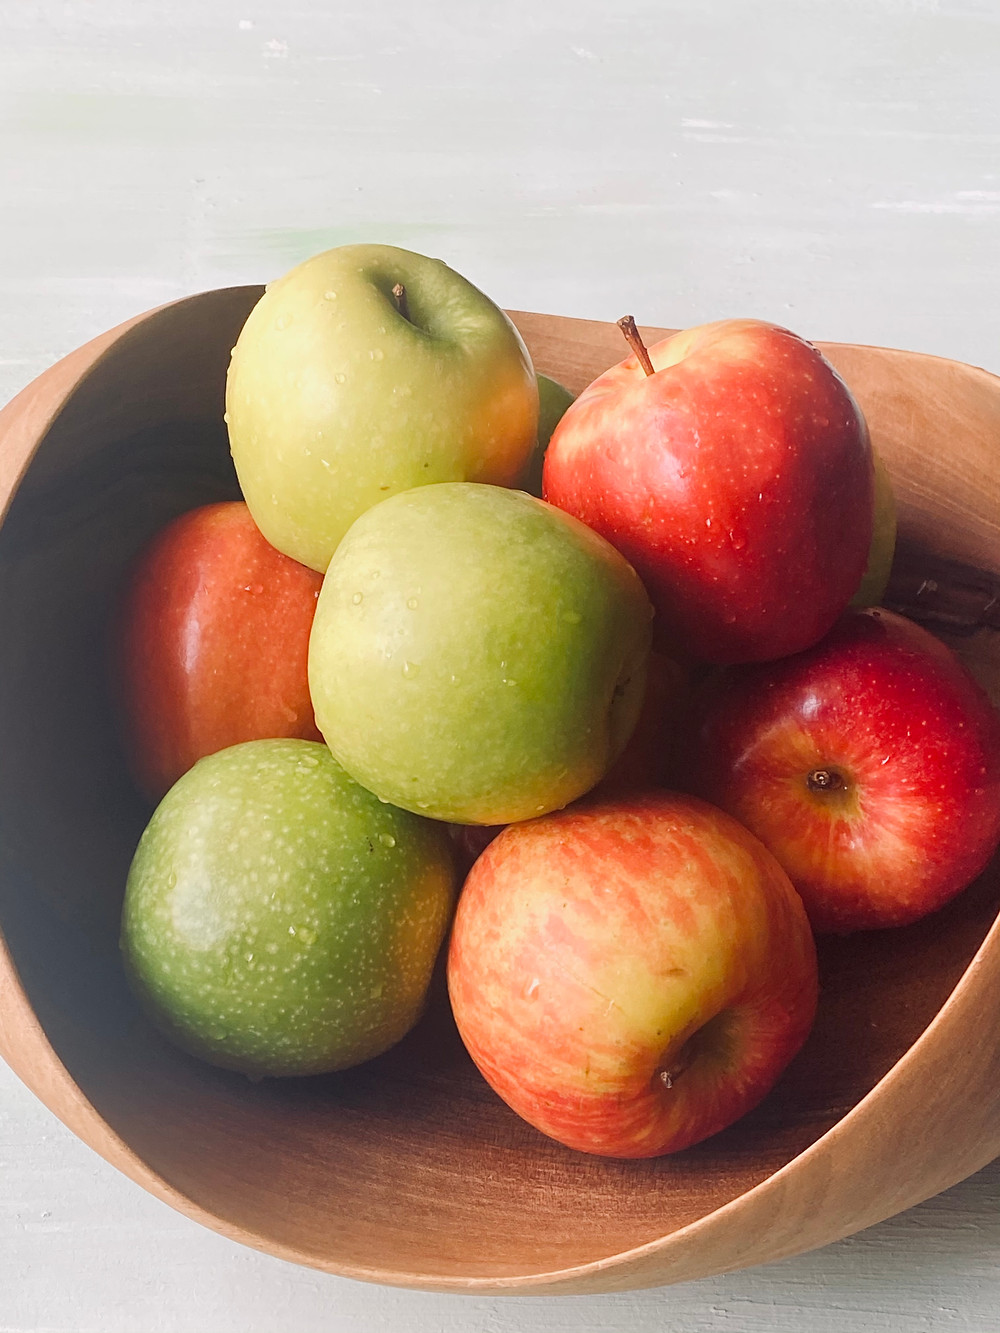 apples for apple pie filling